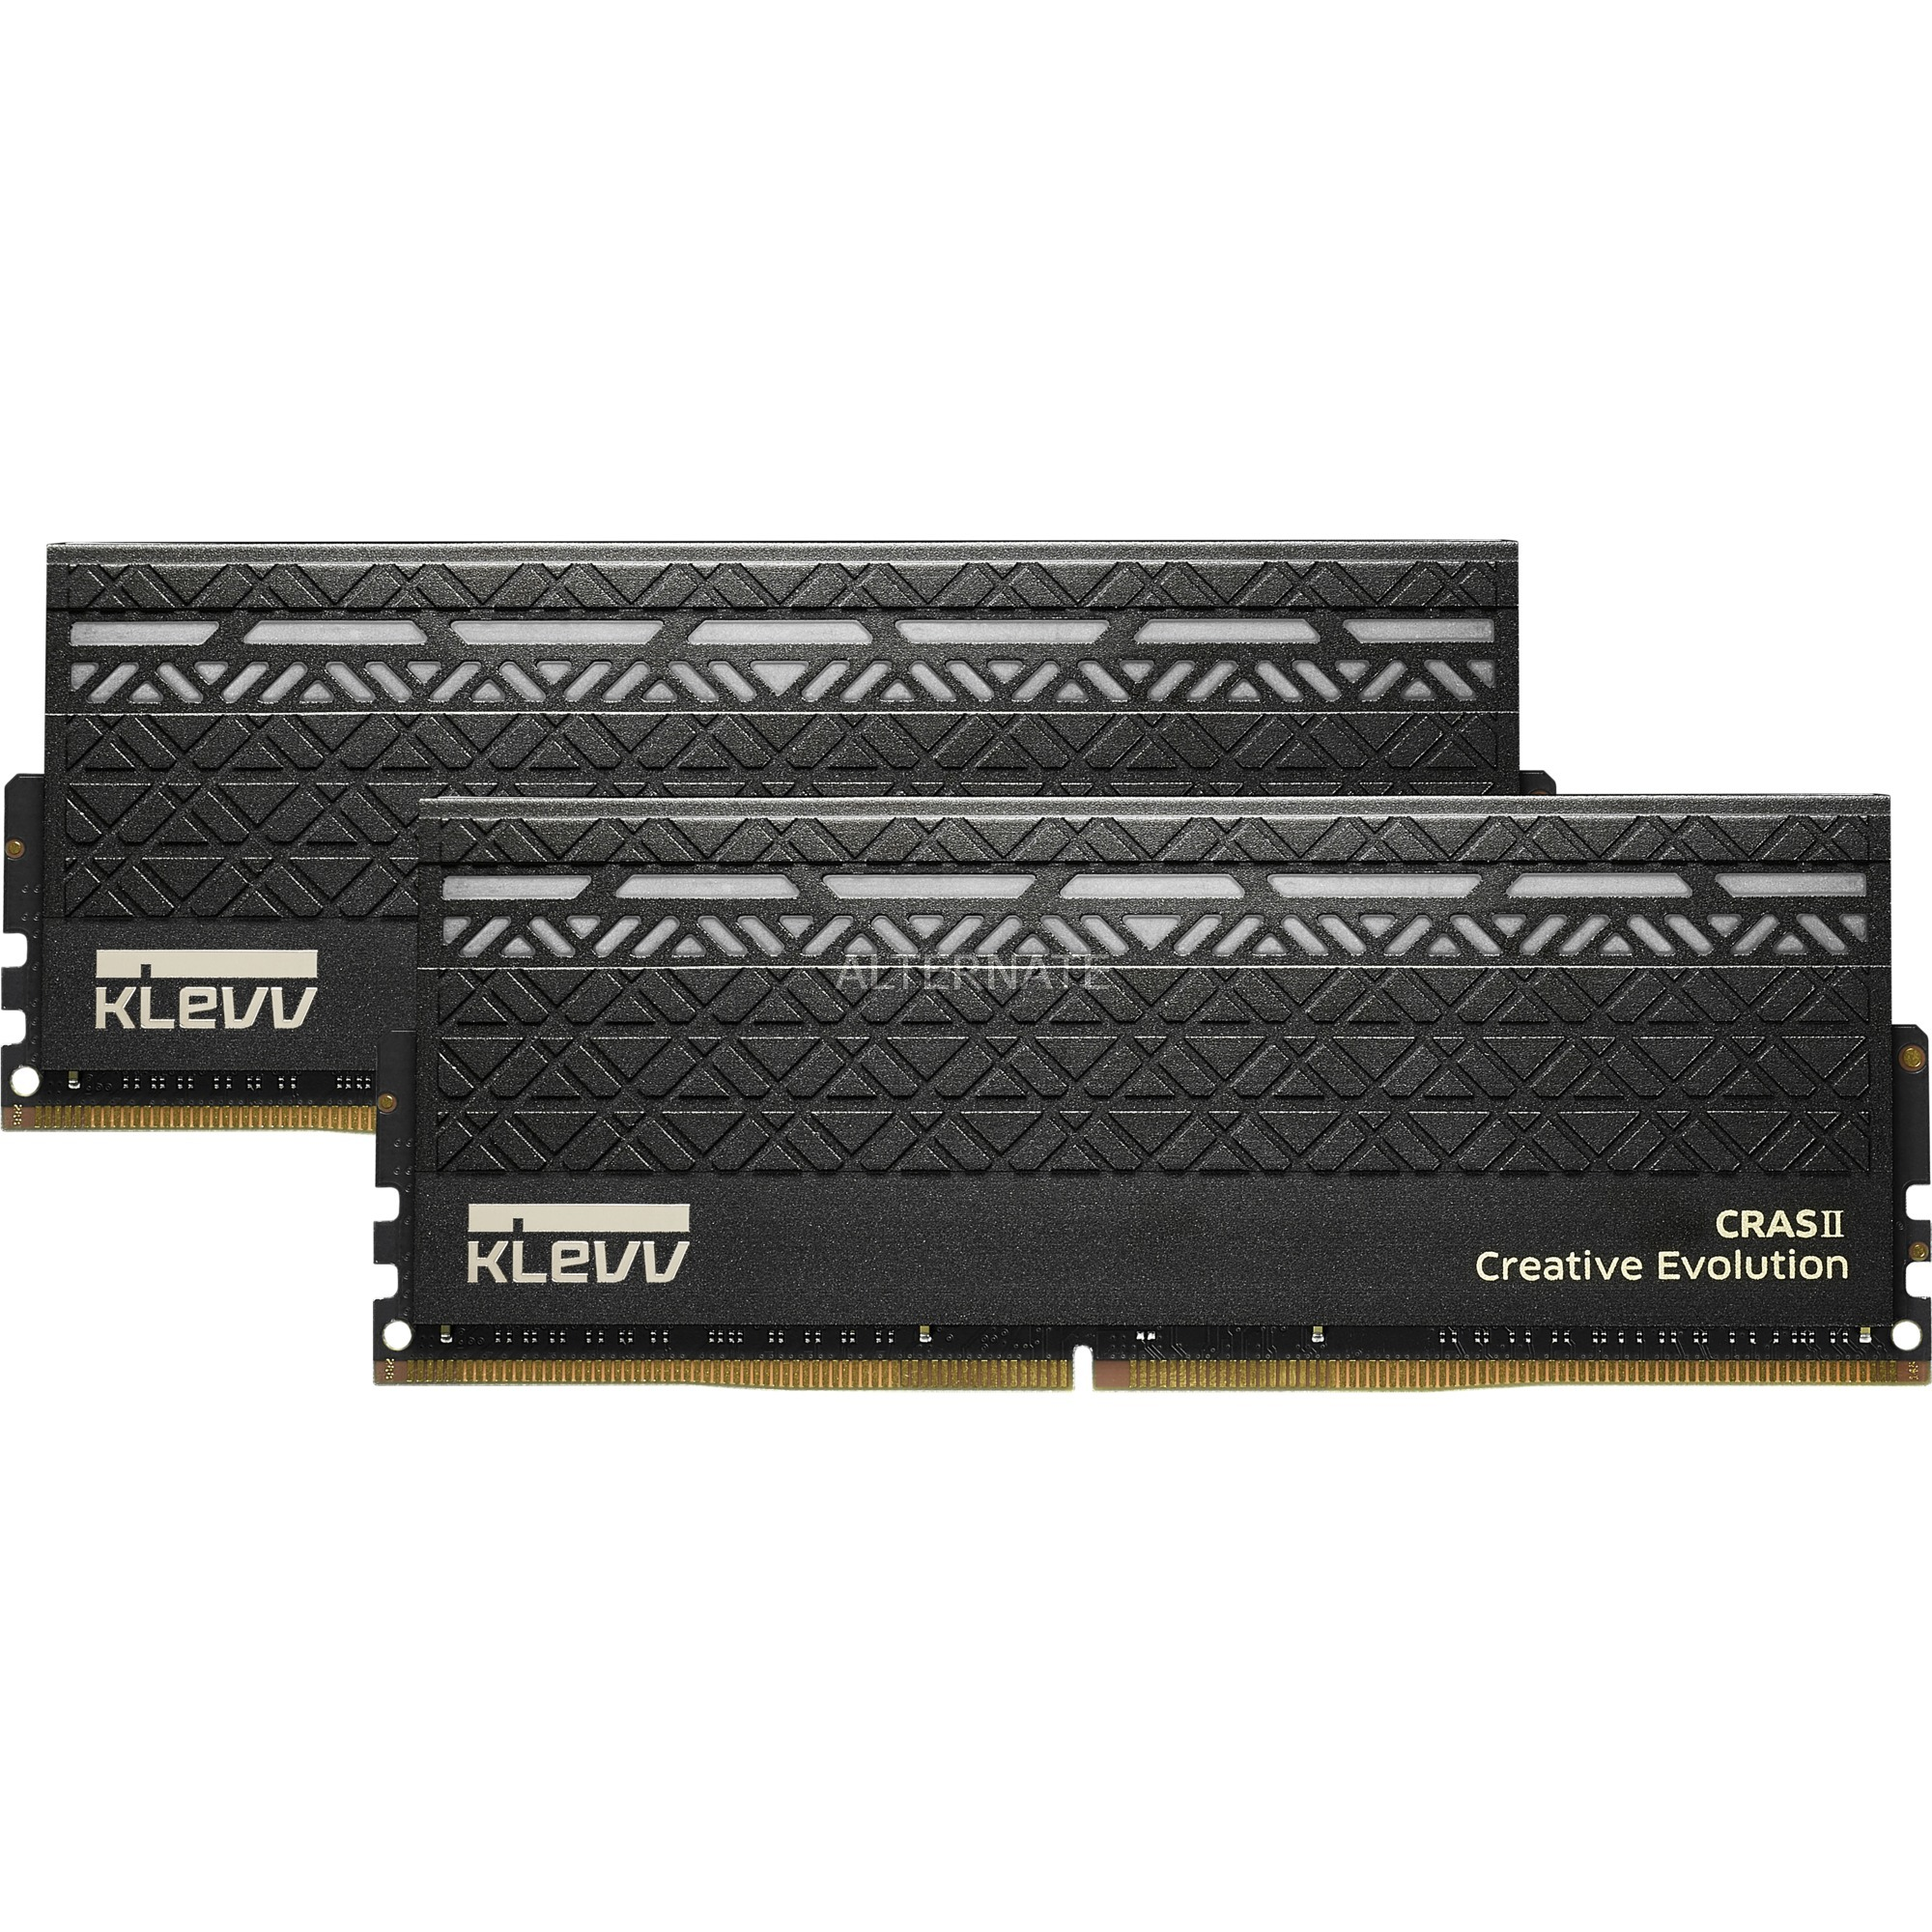 KM4Z8GX2A-3000-15-16-16-36-1, Memoria RAM